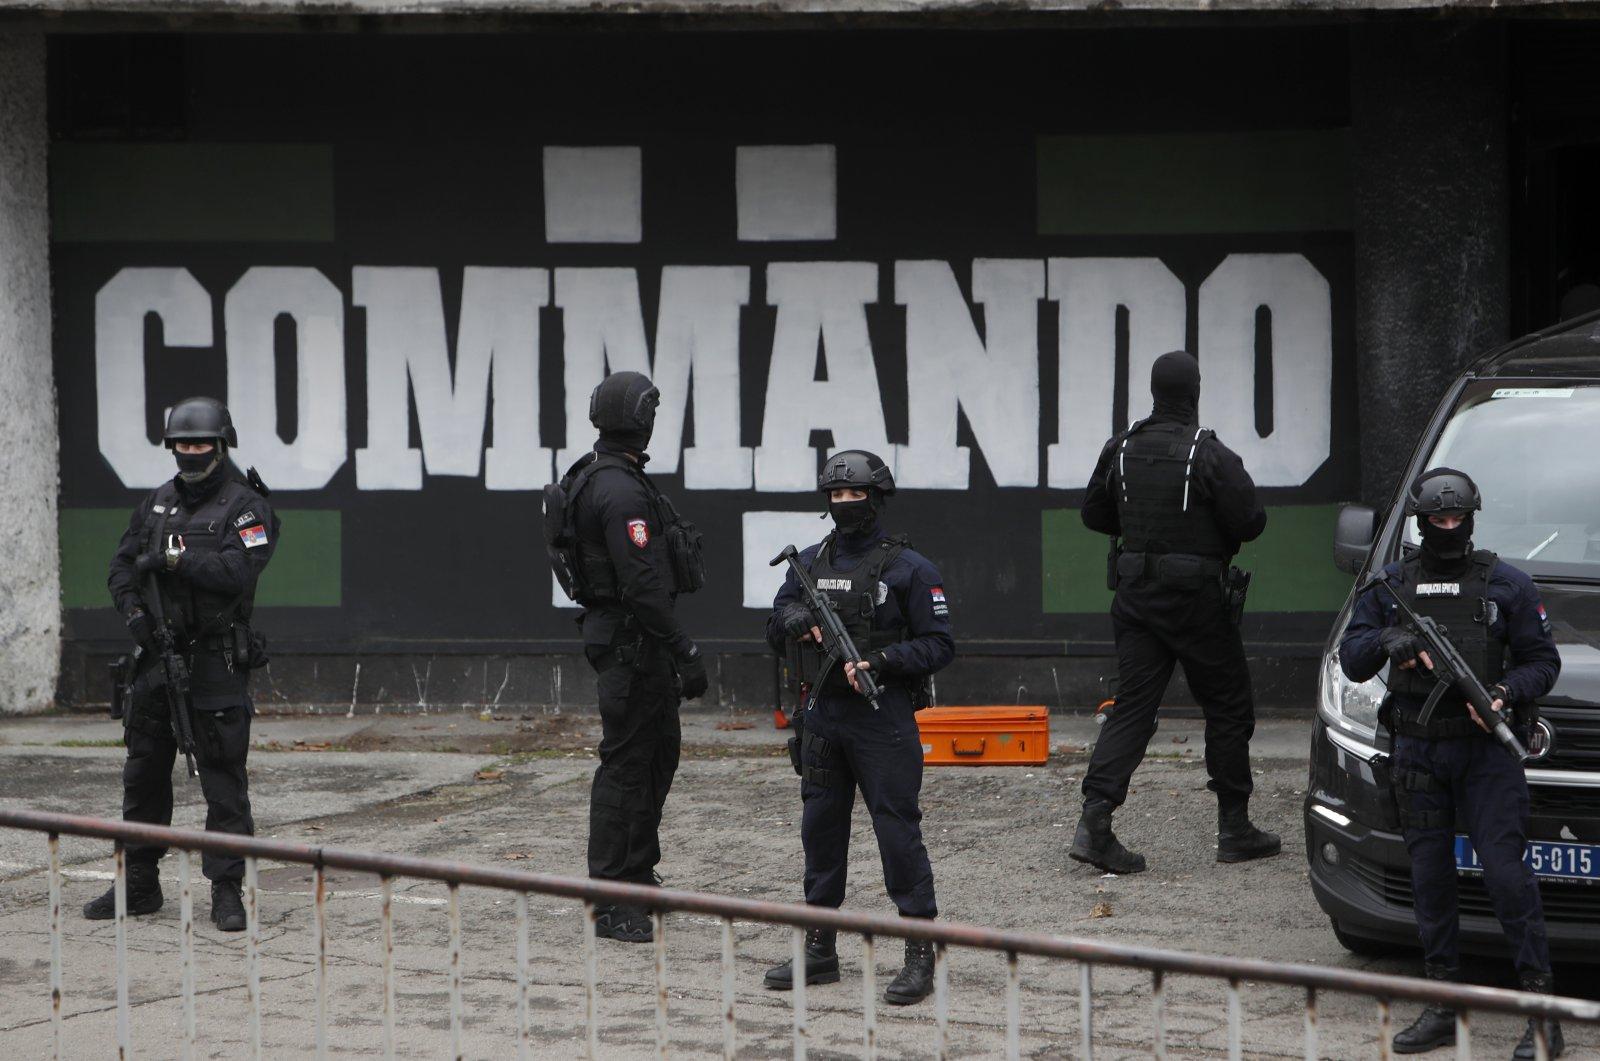 Serbian police officers guard Partizan stadium during a raid, in Belgrade, Serbia, Feb. 4, 2021. (AP Photo)